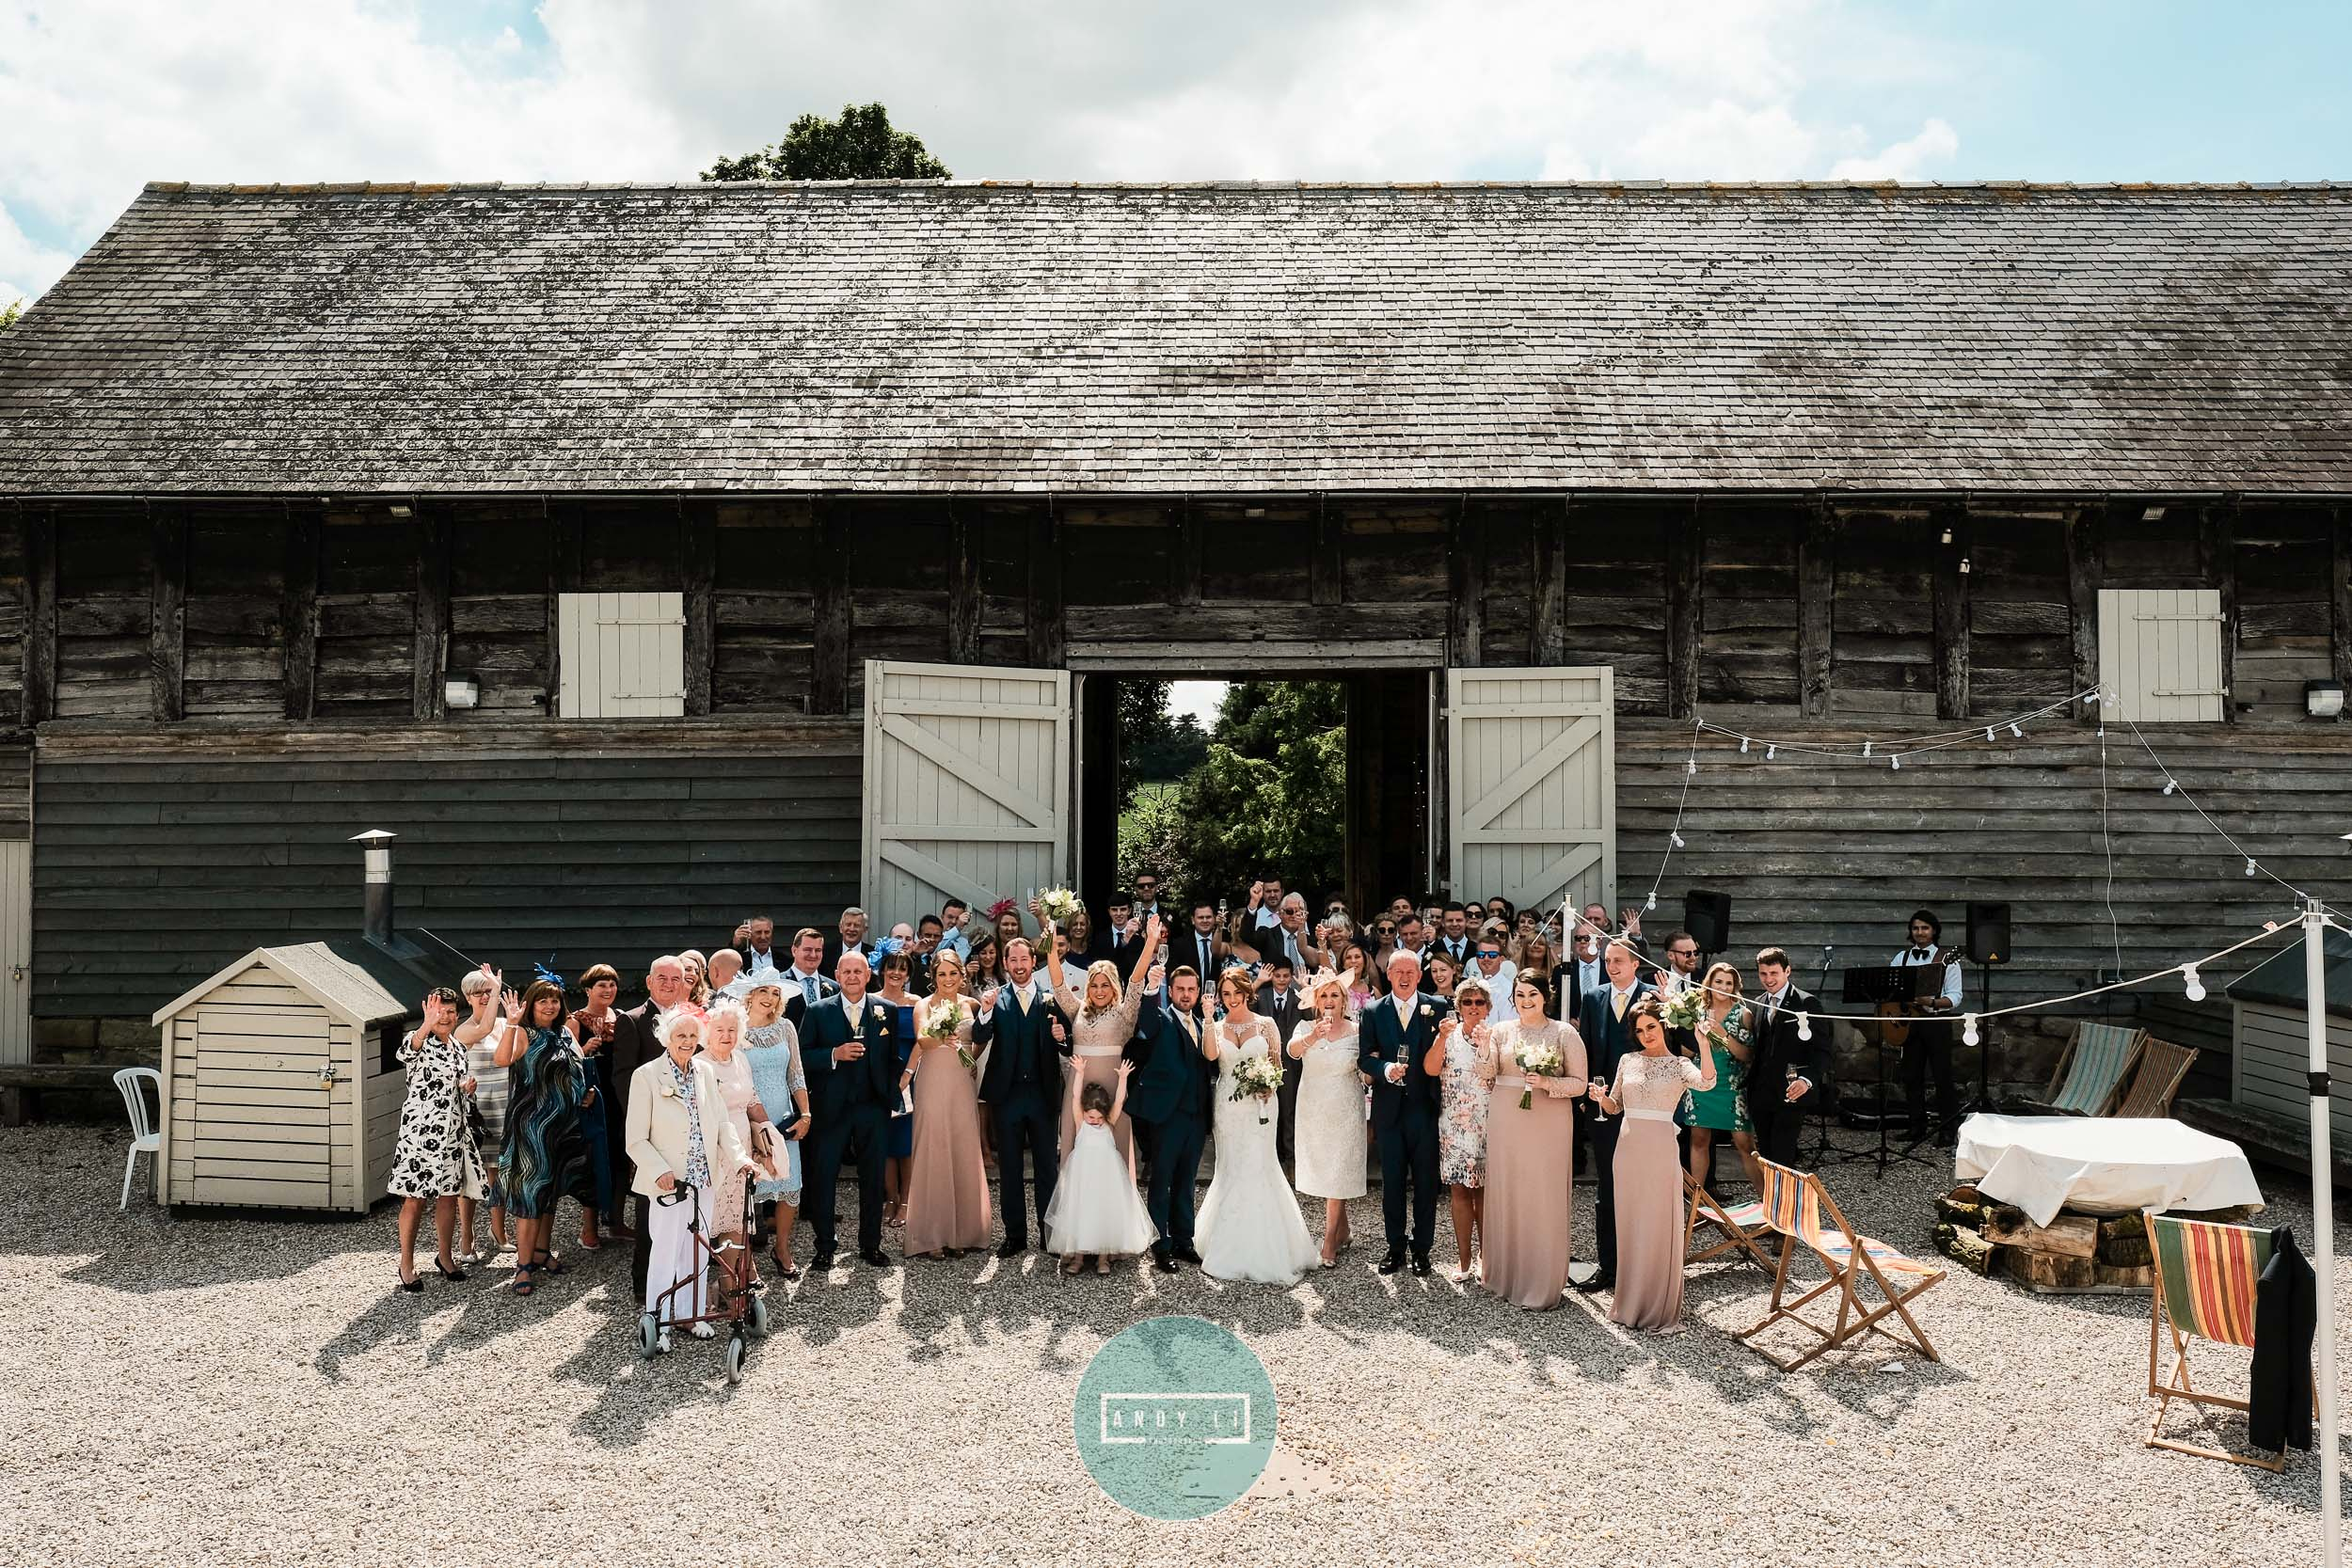 Pimhill Barn Wedding Photographer-077-XPRO6251.jpg